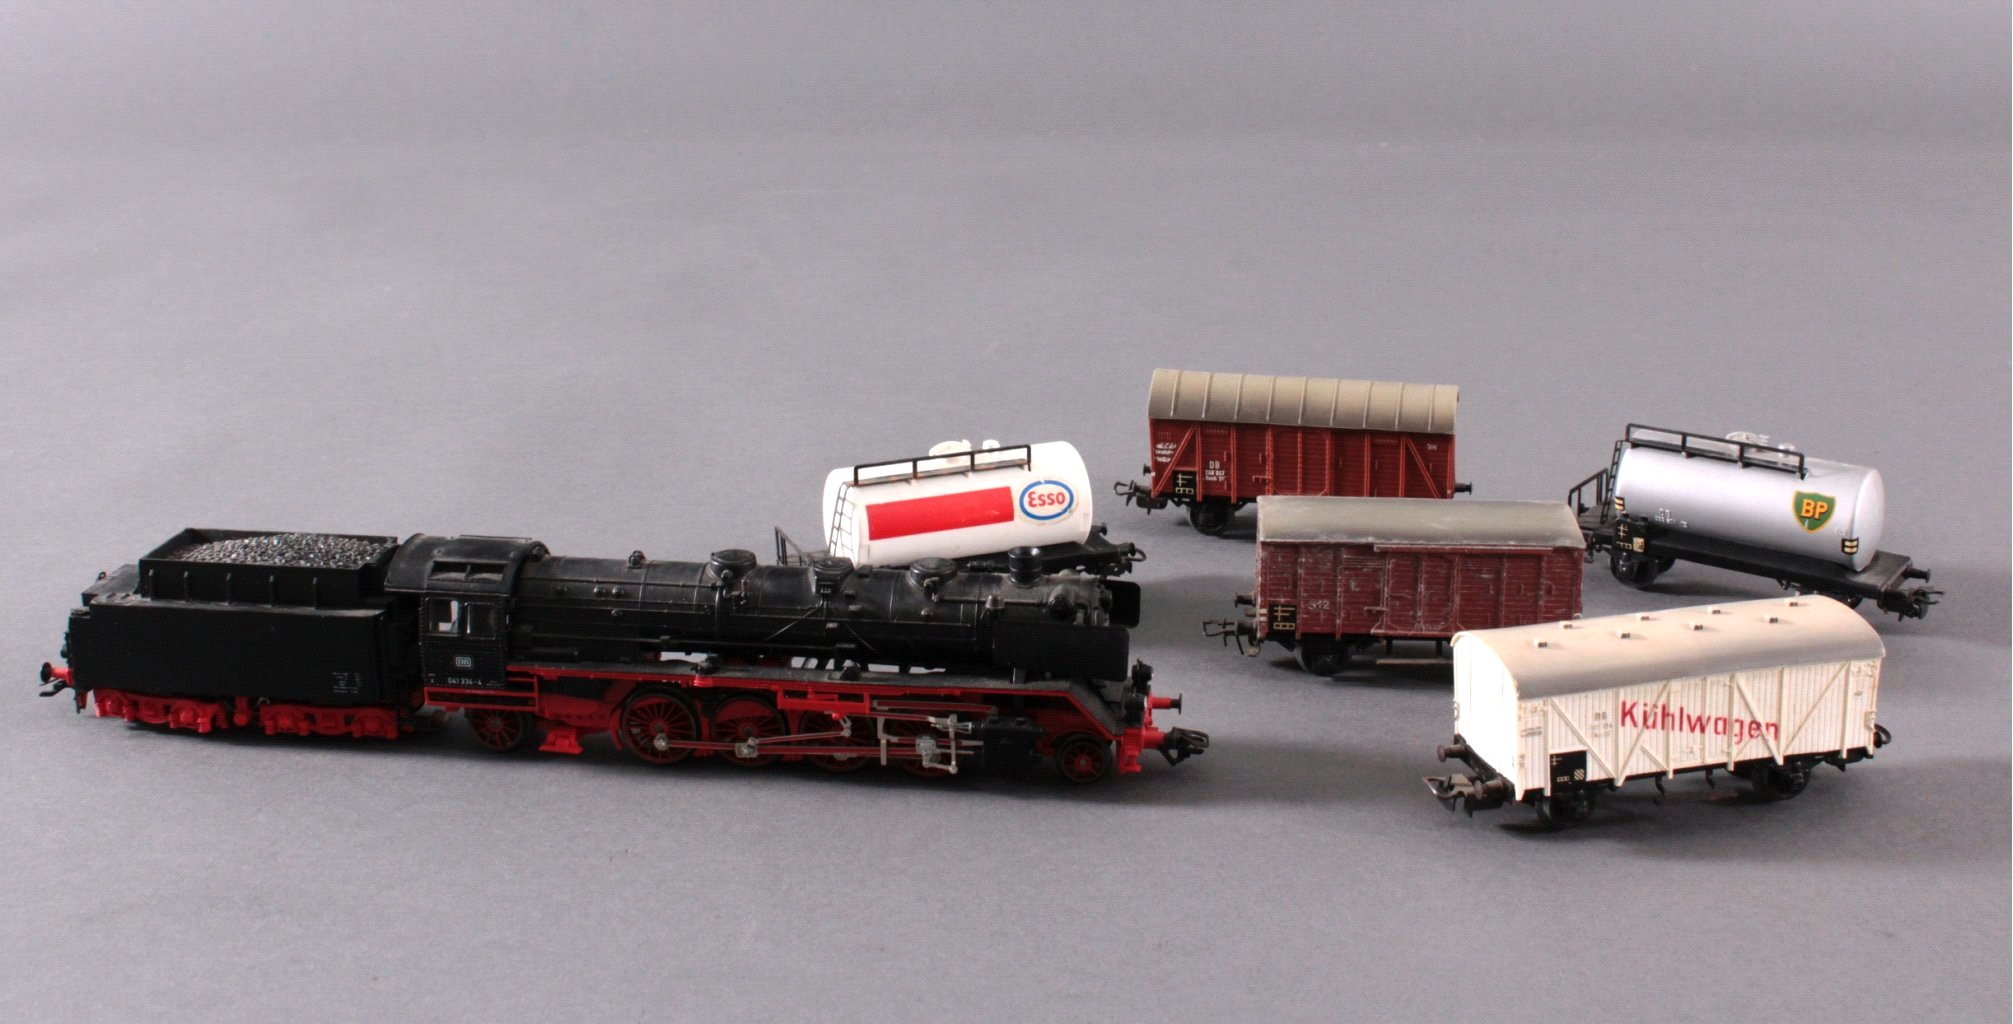 Märklin BR 041334-4 Dampf-Lok DB in schwarz mit